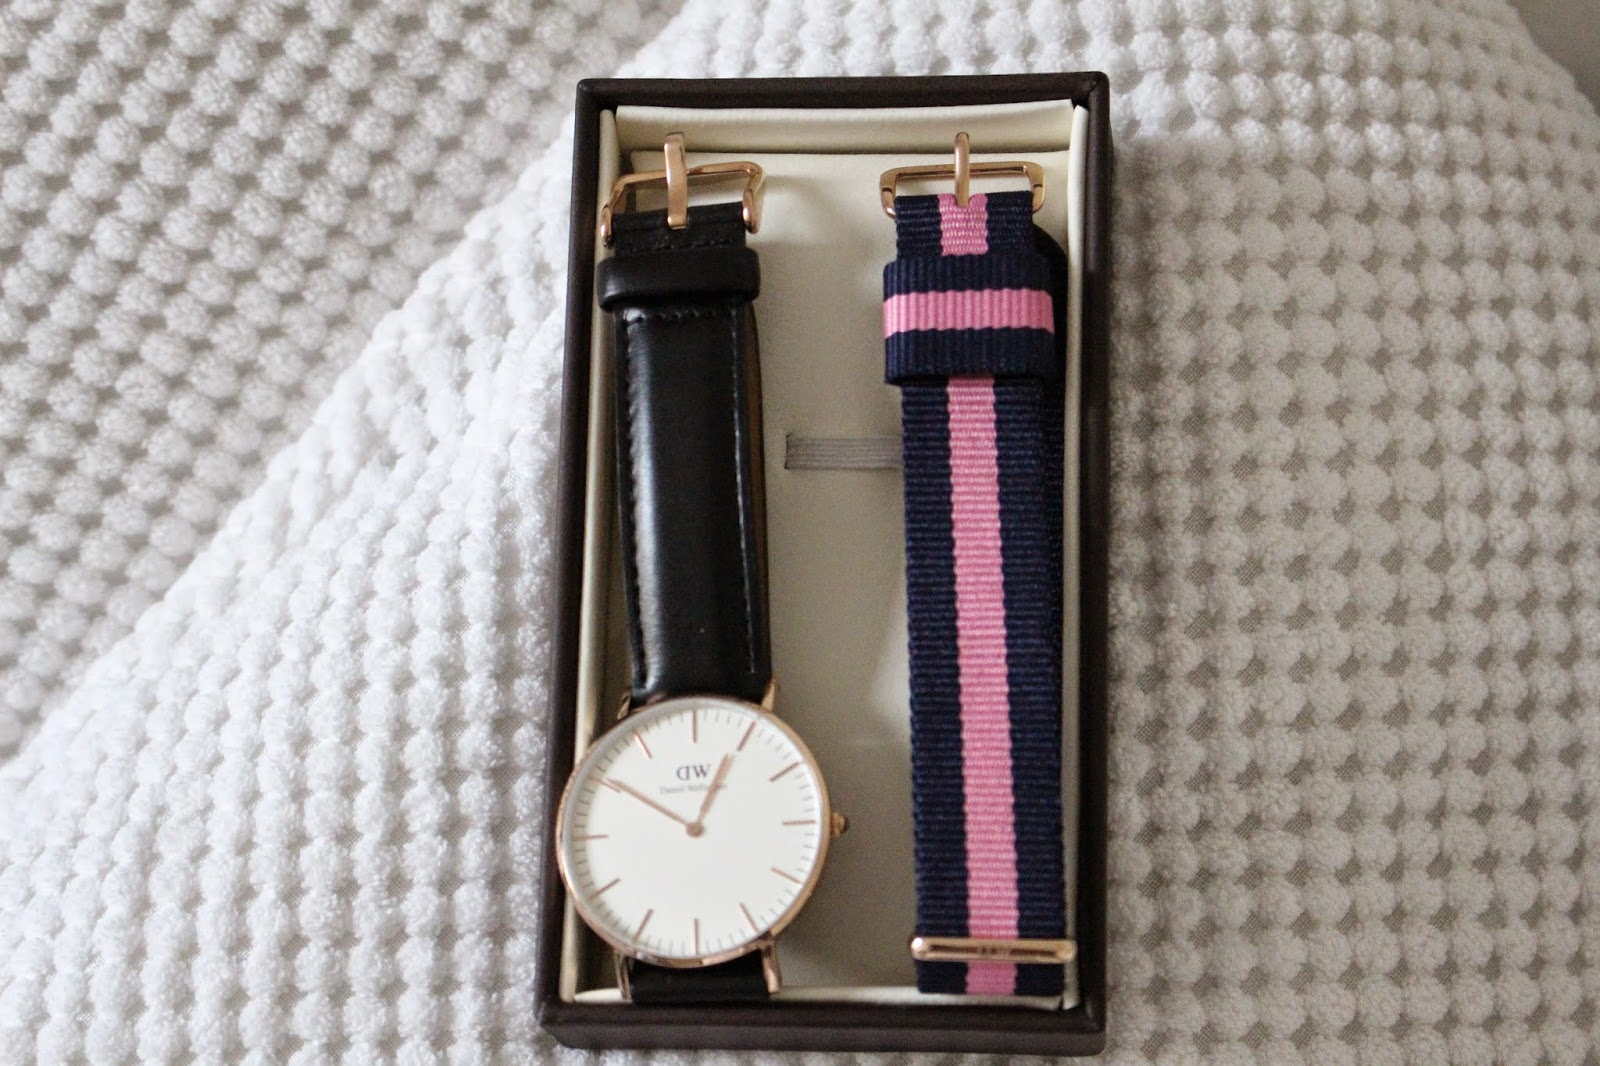 montre daniel wellington changer le bracelet. Black Bedroom Furniture Sets. Home Design Ideas